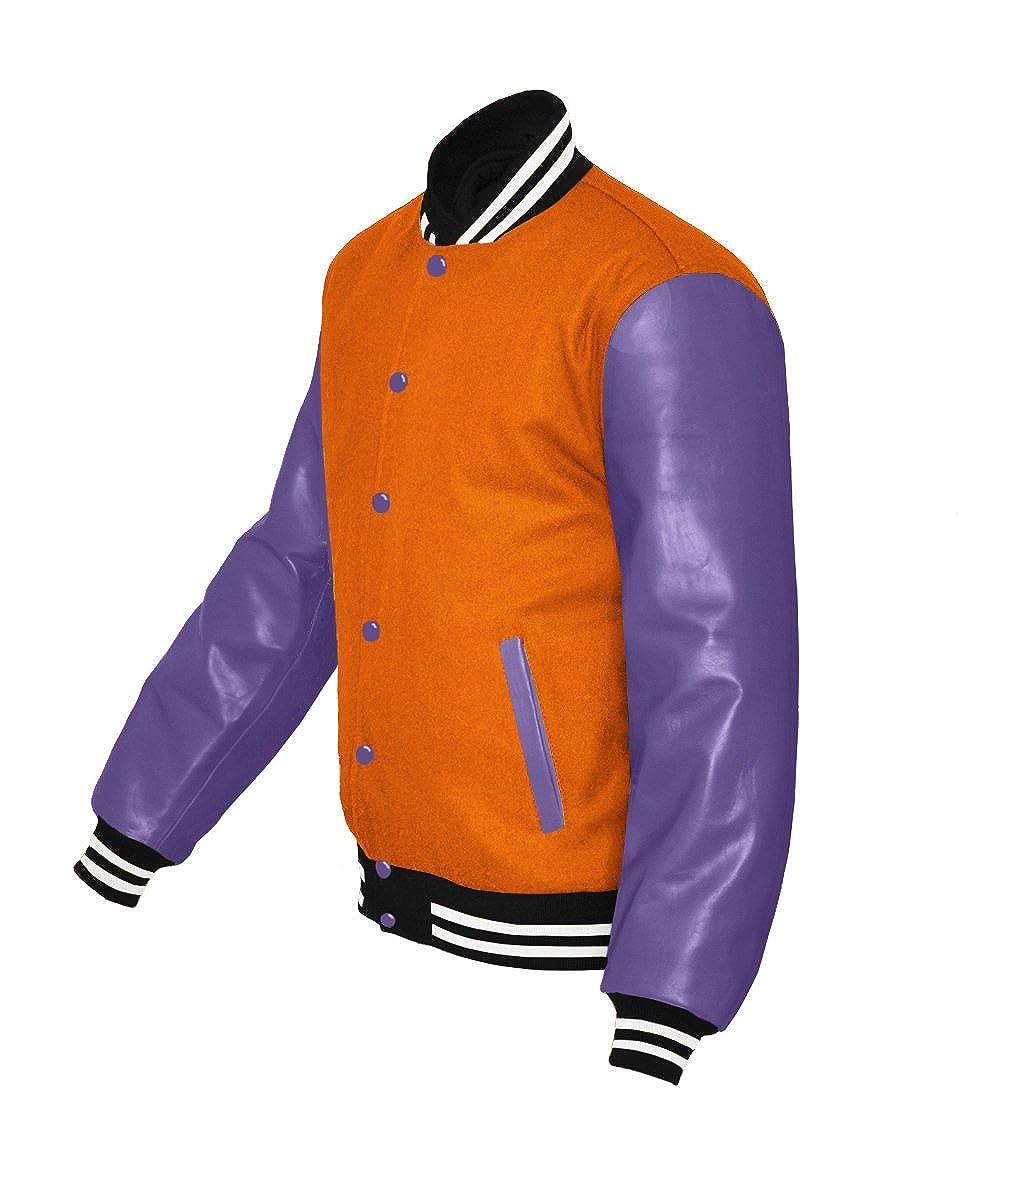 luvsecretlingerie Original American Varsity Real Purple Leather Letterman College Baseball Kid Wool Jackets #P-W-P